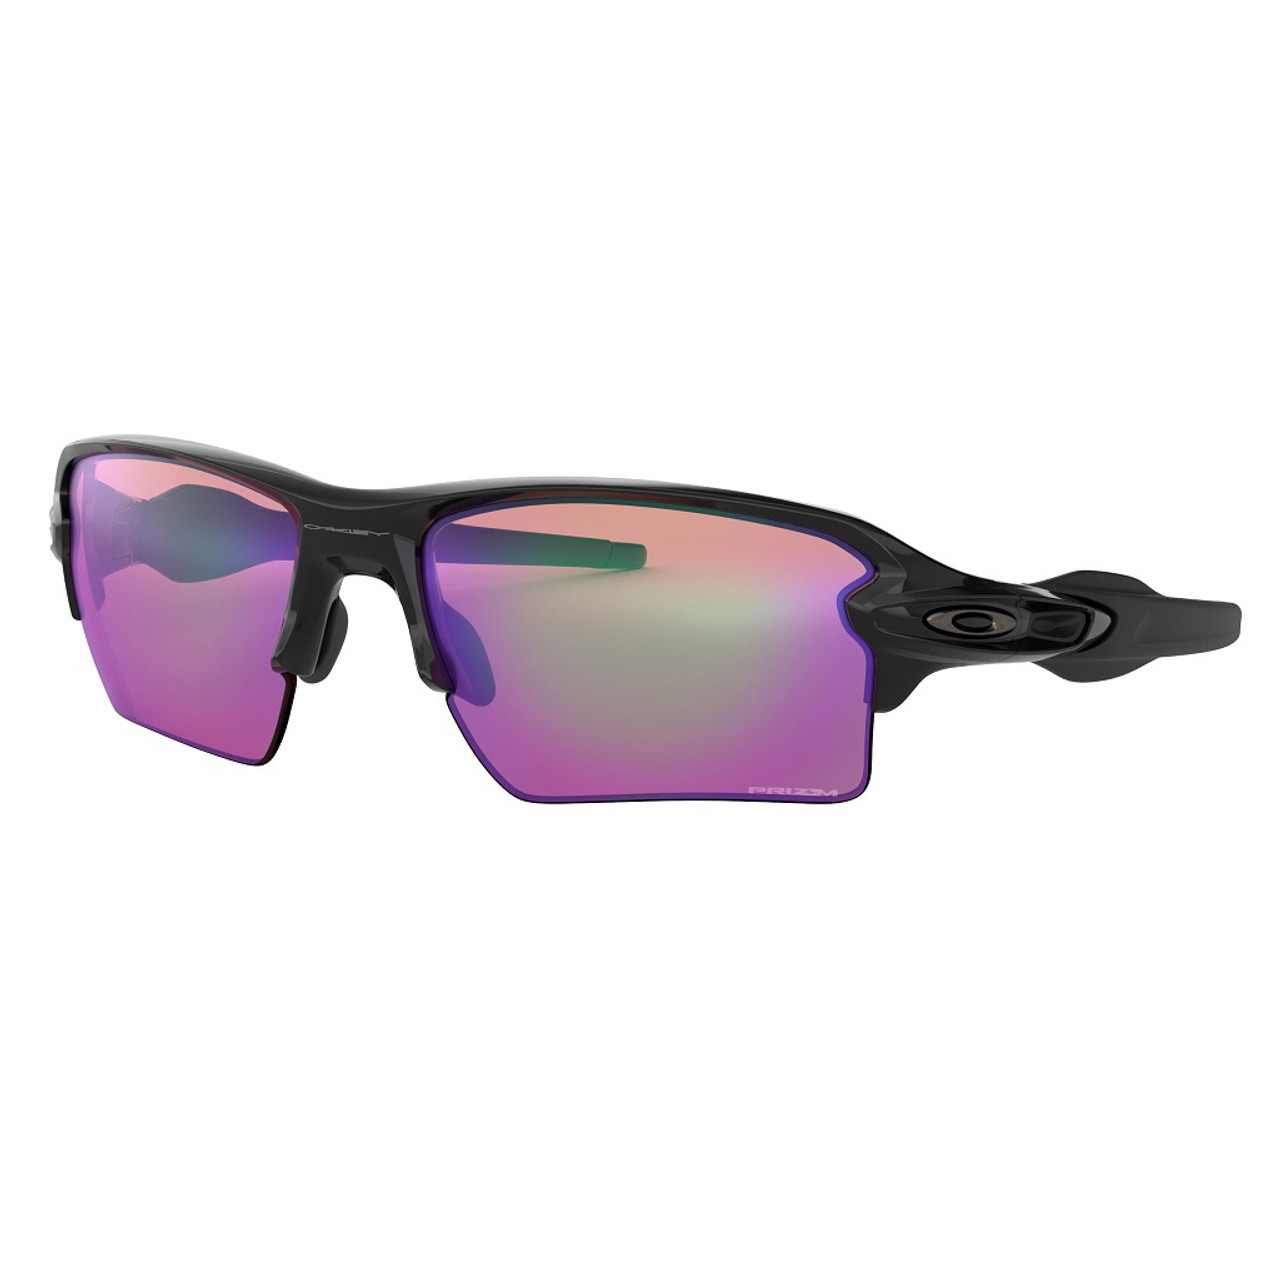 Polished Black w/ Prizm Golf - Oakley Flak 2.0 Sunglasses